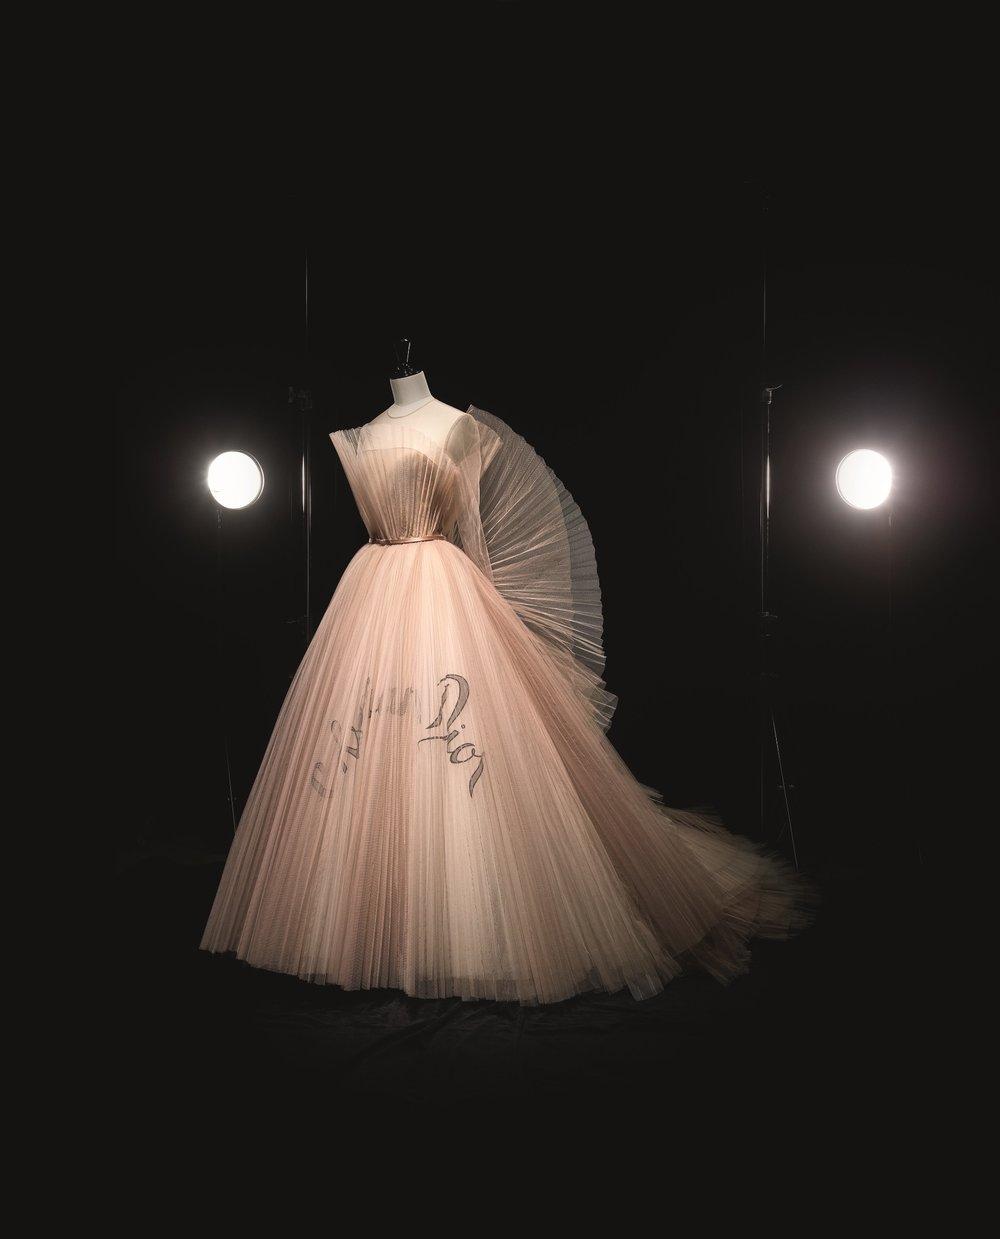 Christian Dior by Maria Grazia Chiuri (b.1964), Dress, Haute Couture, SpringSummer 2018. Photo (c) Laziz Hamani. Laziz Hamani. Dior Héritage collection, Paris.jpg